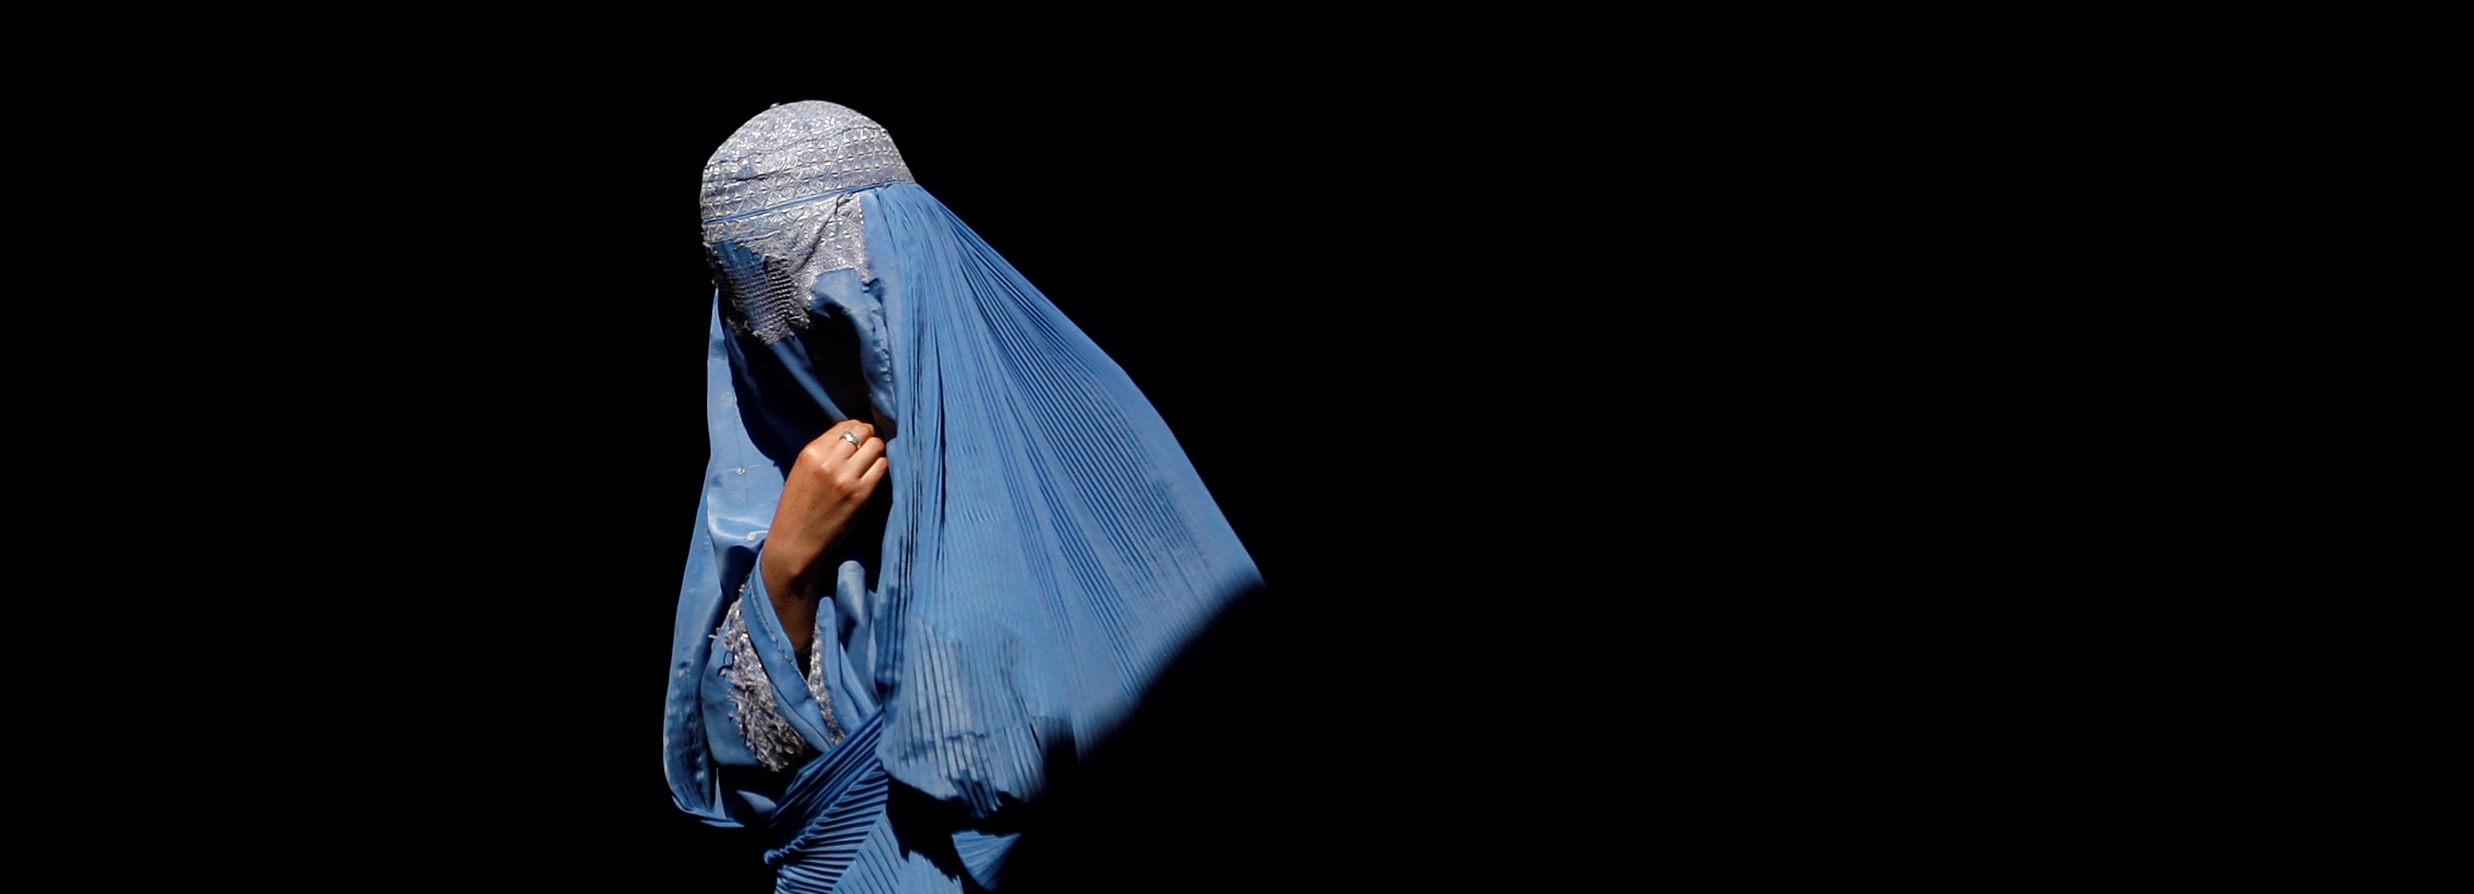 burqa-black.jpg